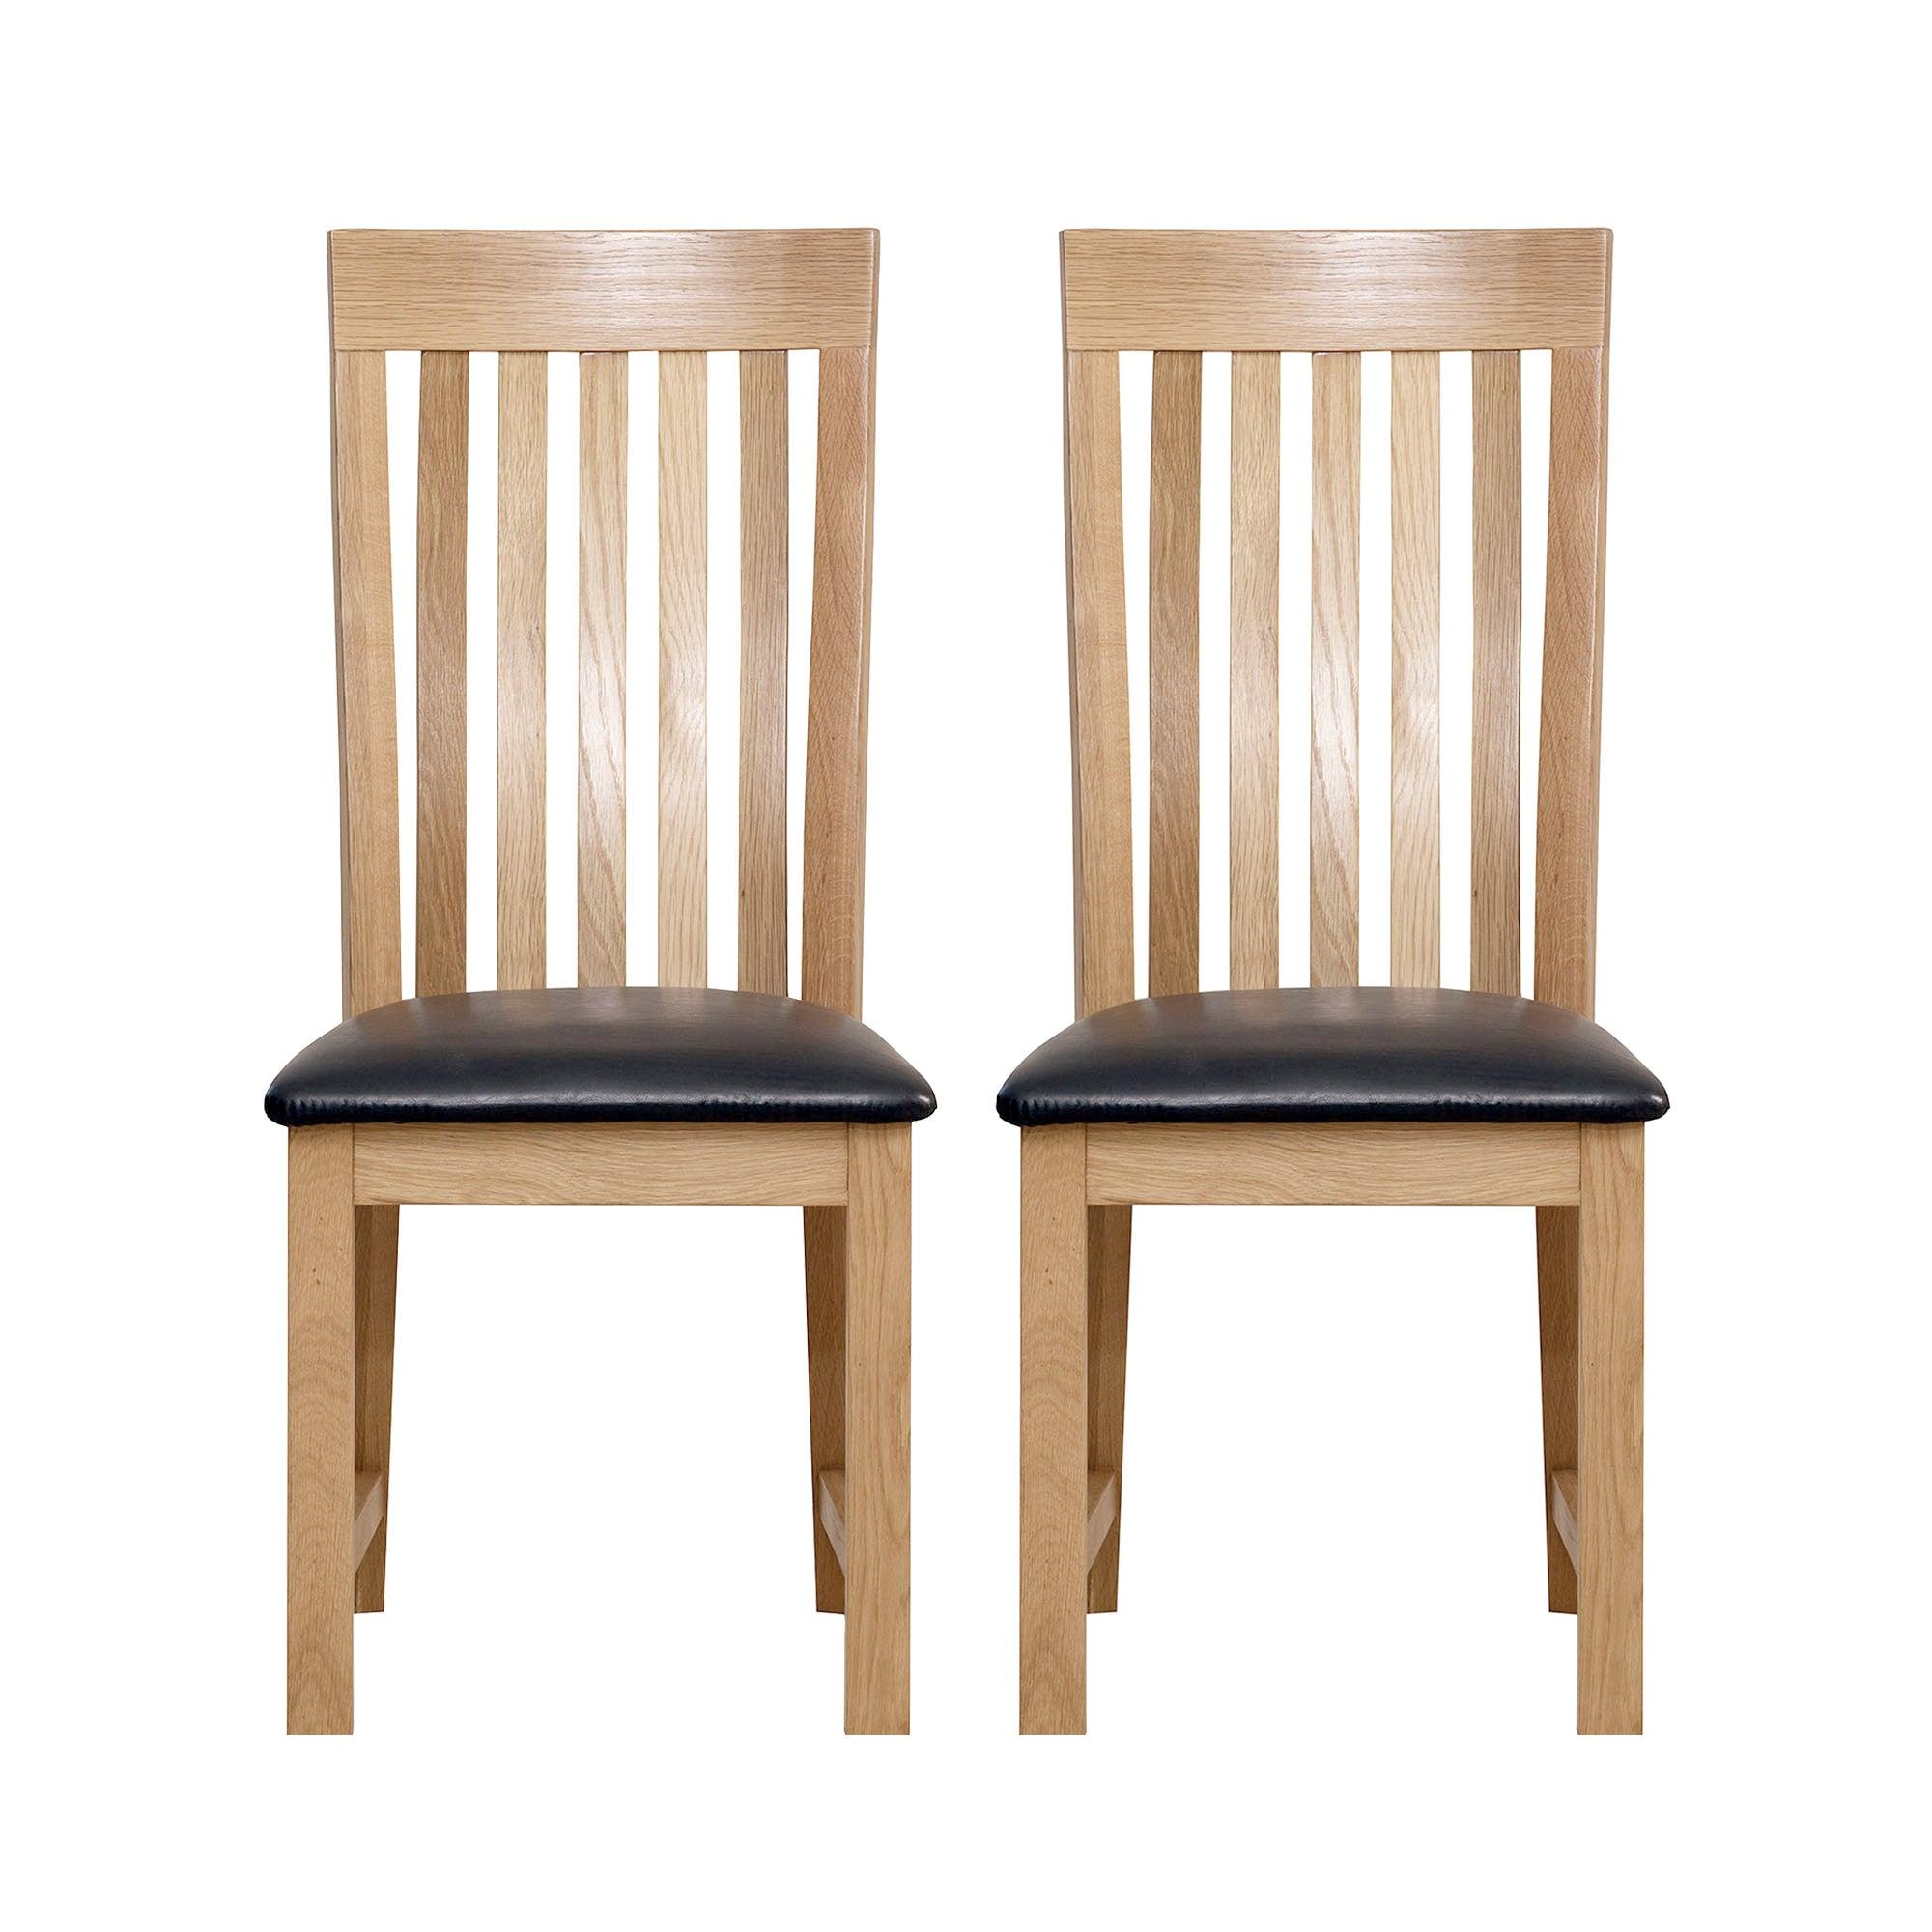 seville oak pair of dining chairs dunelm. Black Bedroom Furniture Sets. Home Design Ideas